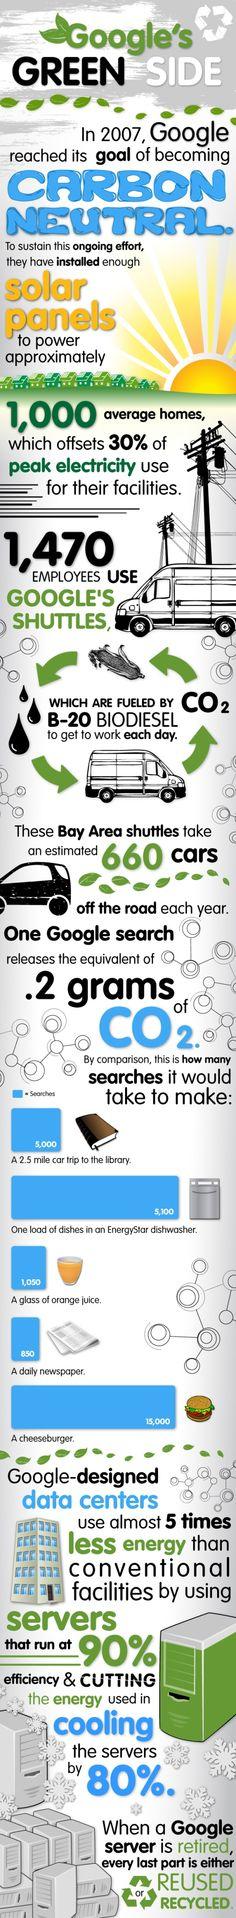 googlegreensm